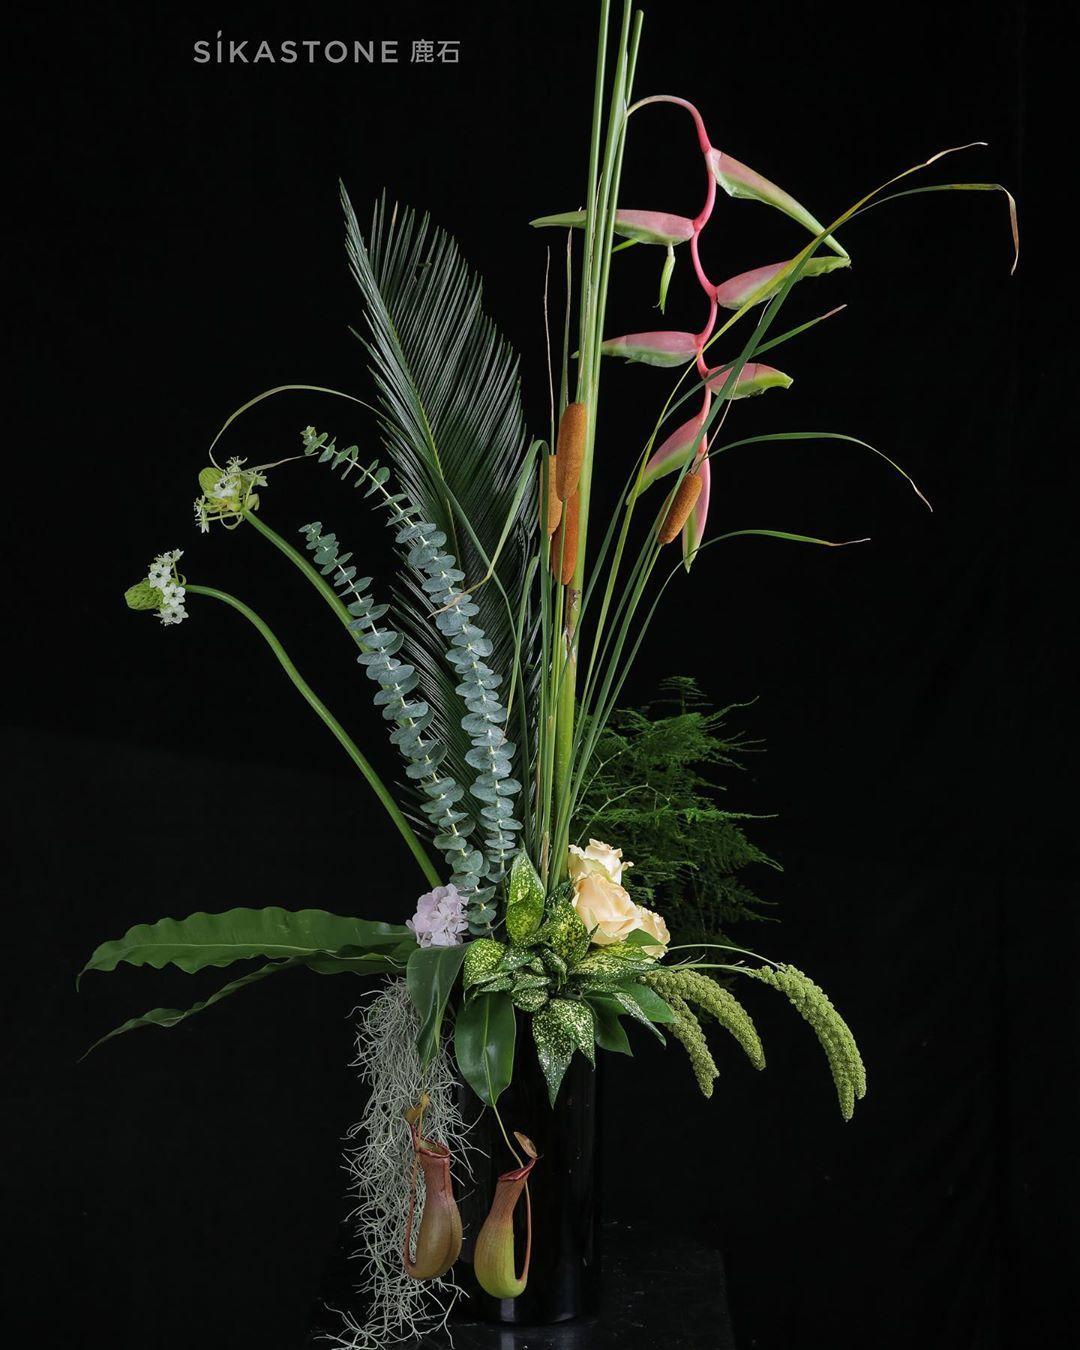 Sikastone Floristry Education On Instagram Fundamental Floral Design Course Worksfrom Jan A Design Course Large Floral Arrangements Floral Arrangements Diy